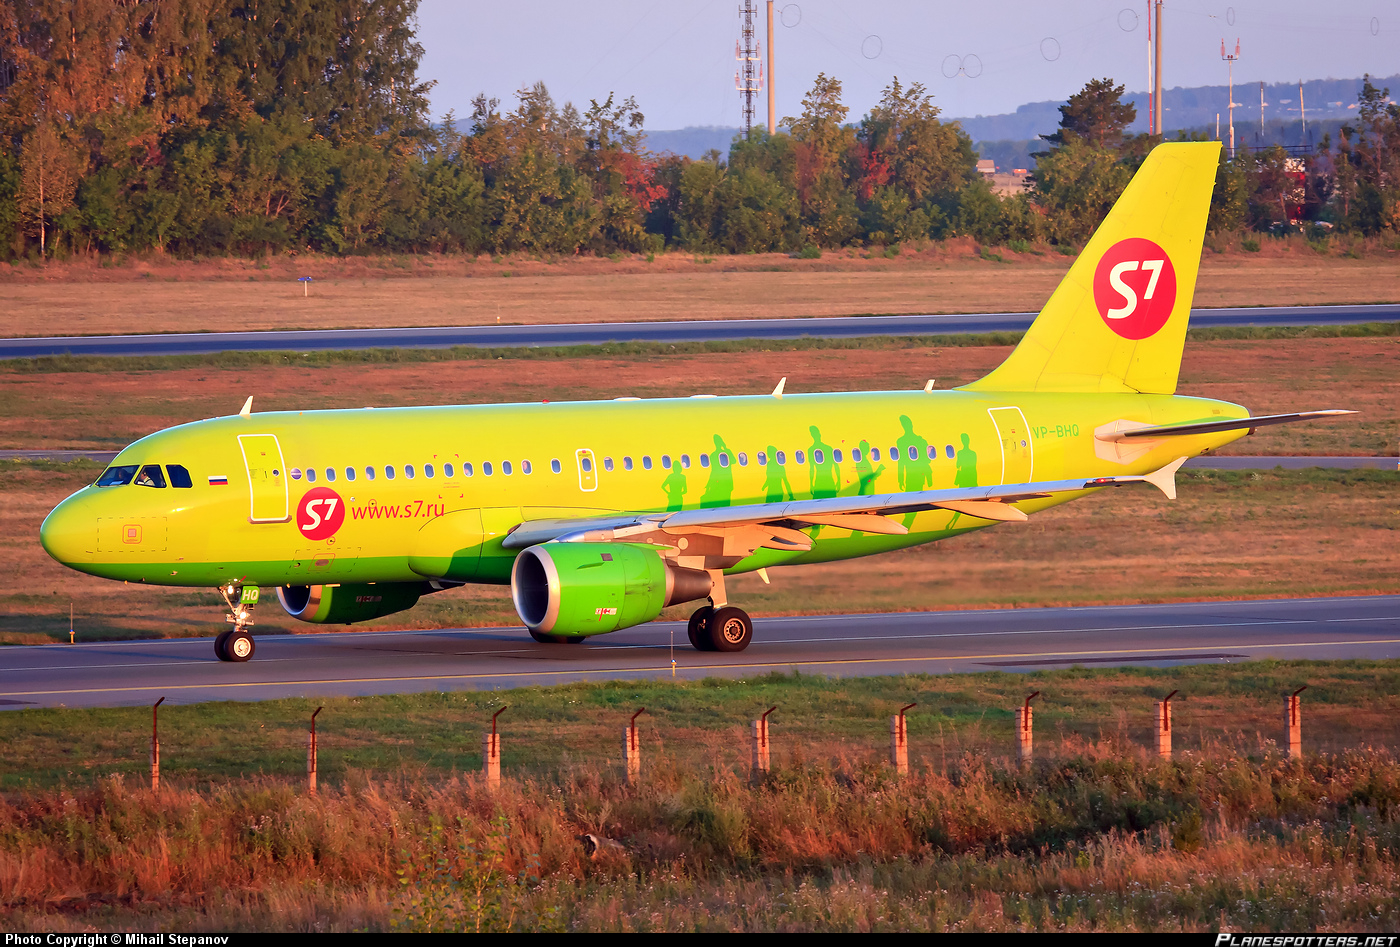 Из тепла в холод. Сочи(AER)-Москва(DME)-Уфа(UFA) с S7 Airlines